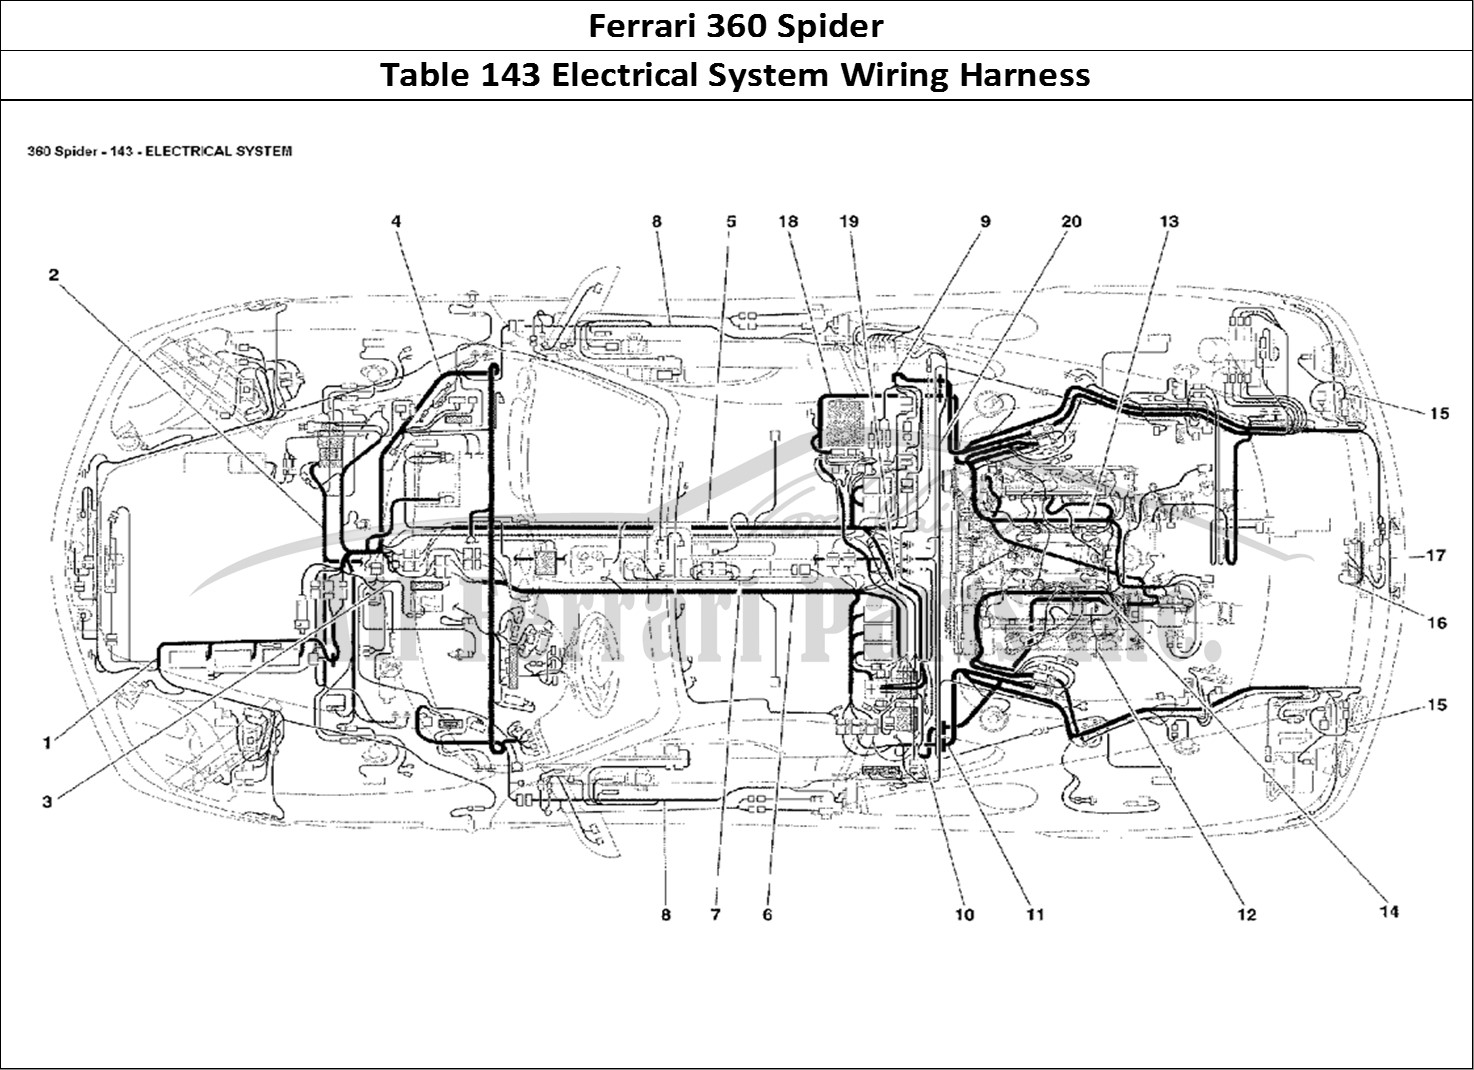 Buy Original Ferrari 360 Spider 143 Electrical System